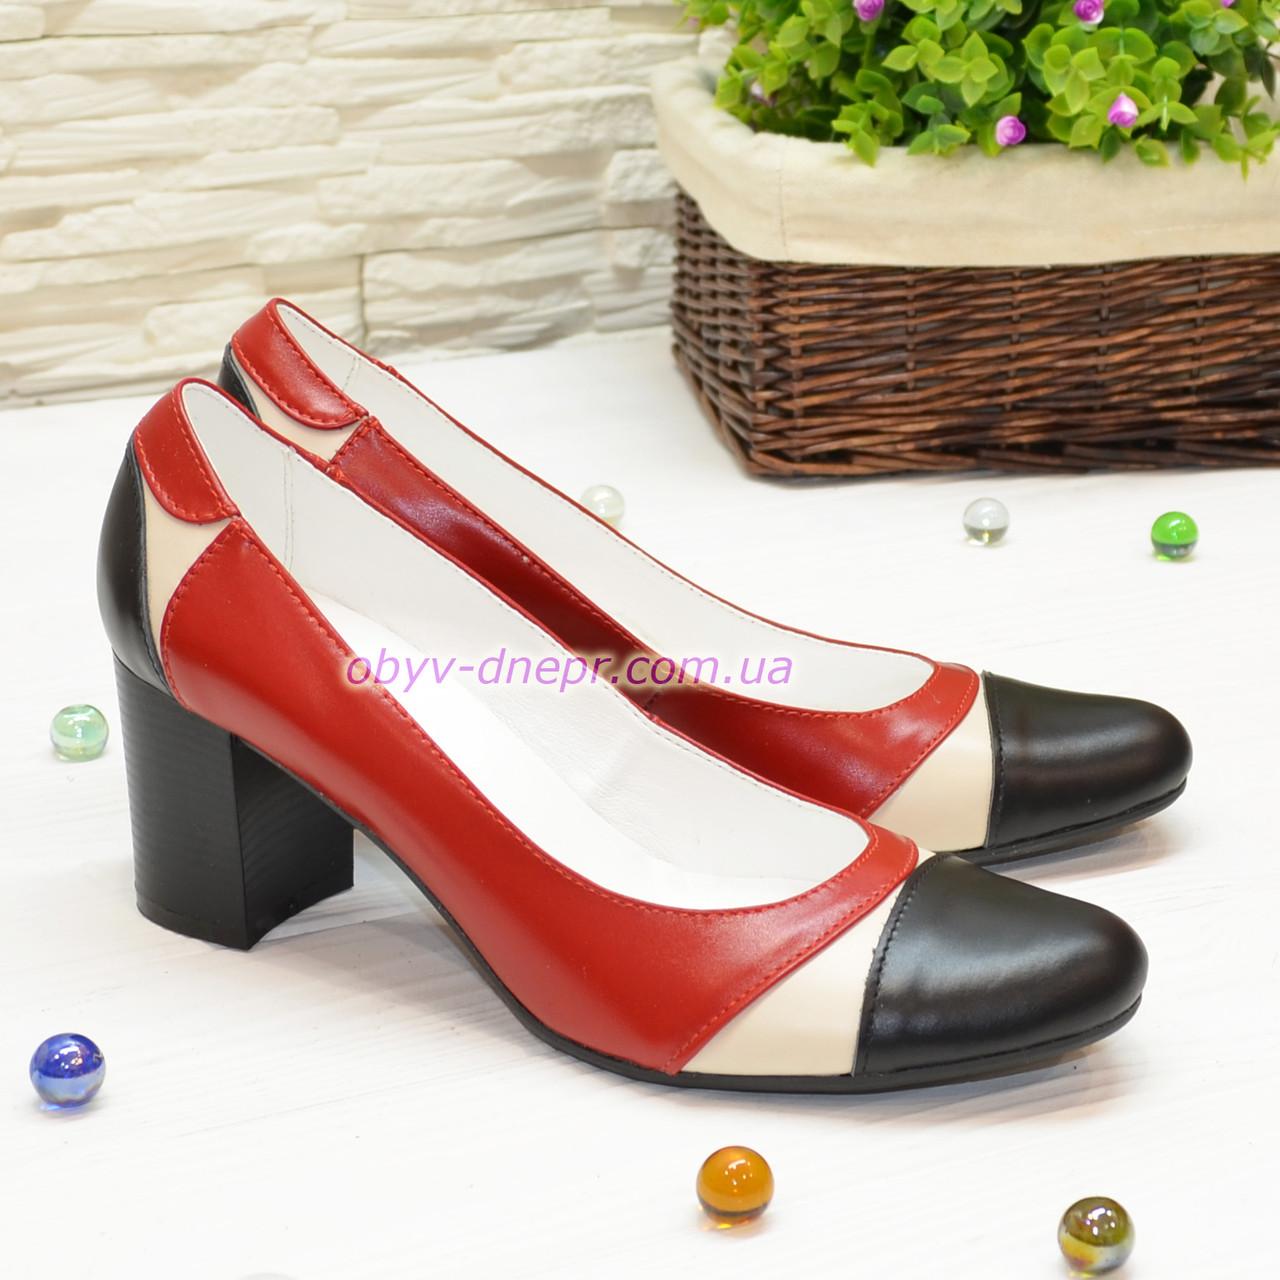 Туфли-лодочки женские кожаные,  на устойчивом каблуке